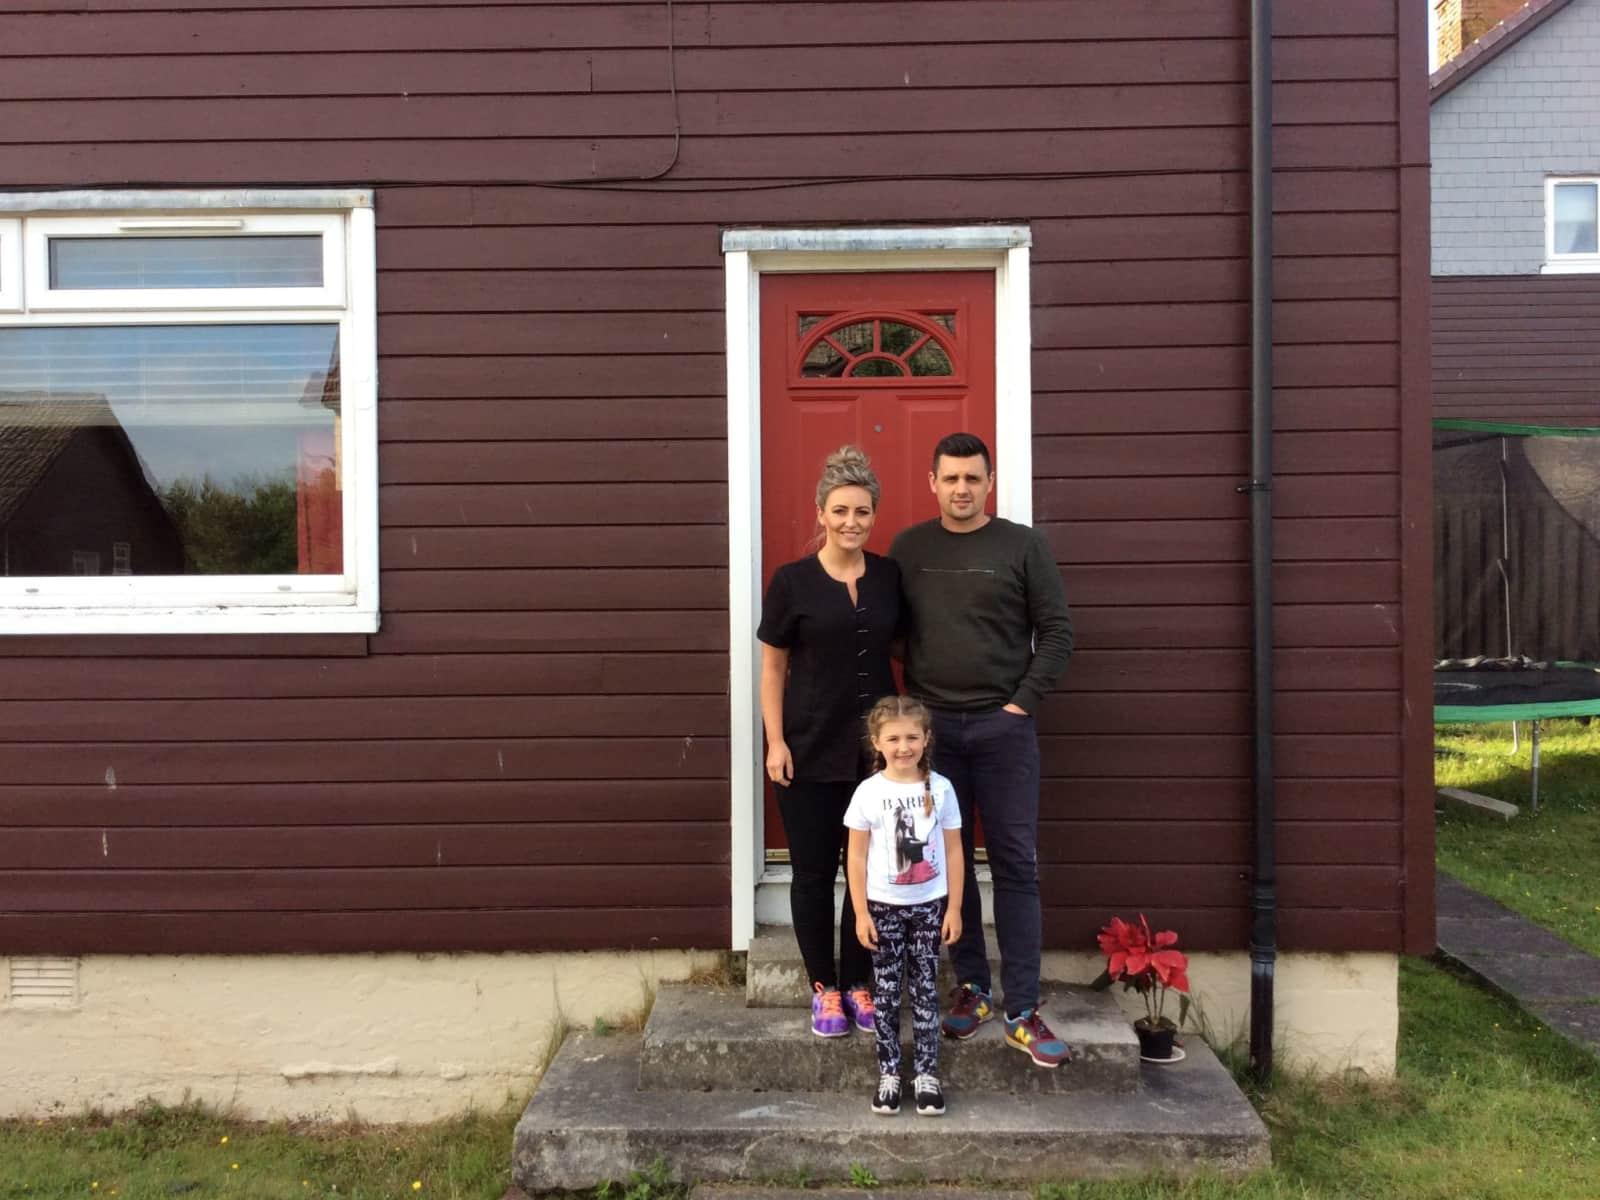 Les & Pamela from Fauldhouse, United Kingdom